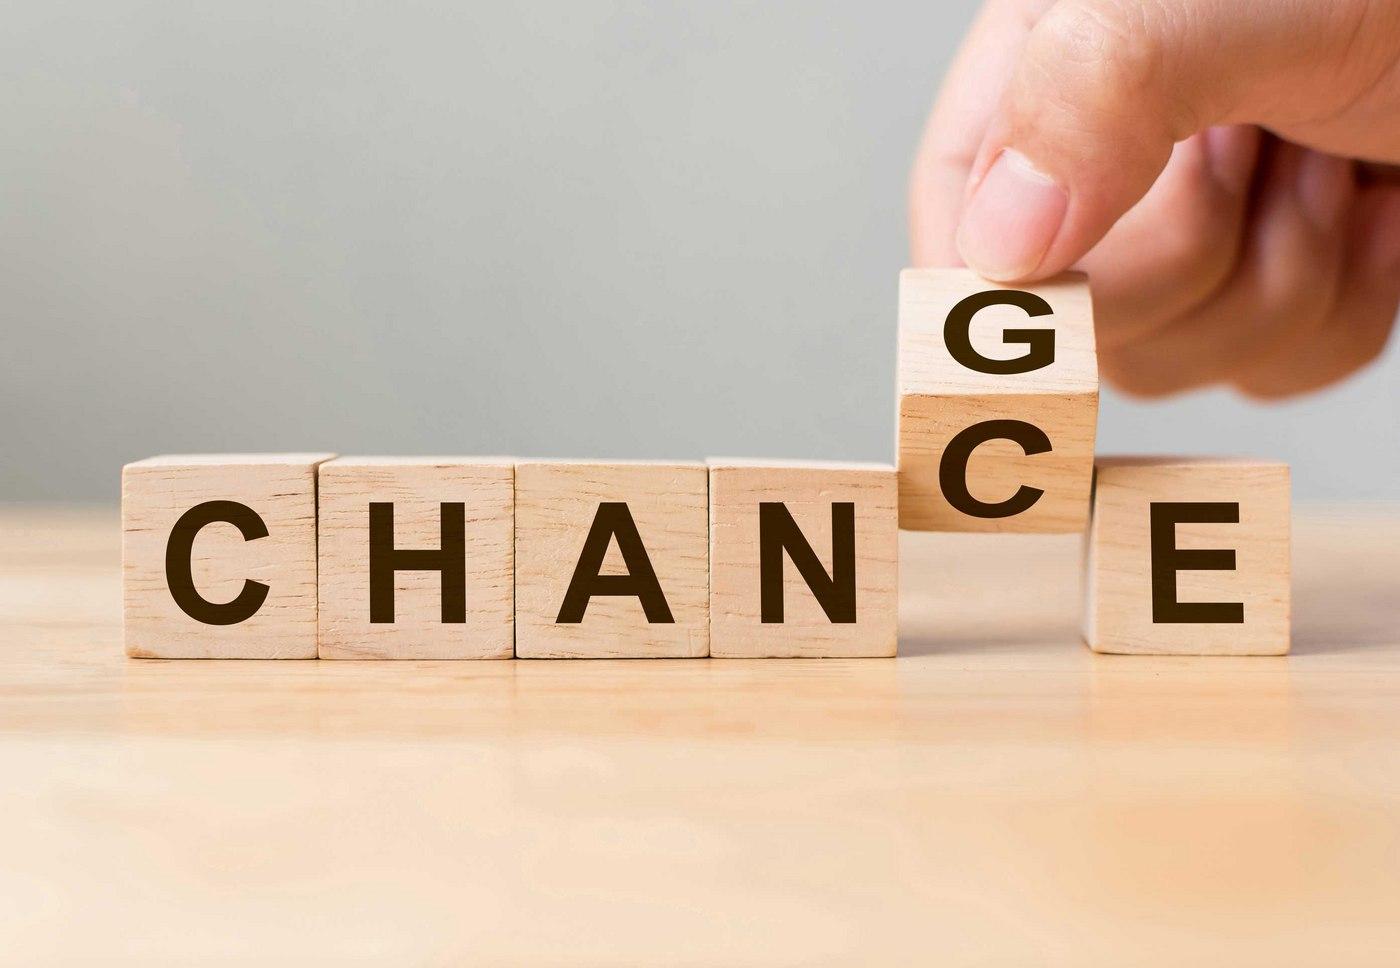 Change Brings Chance Wooden Blocks